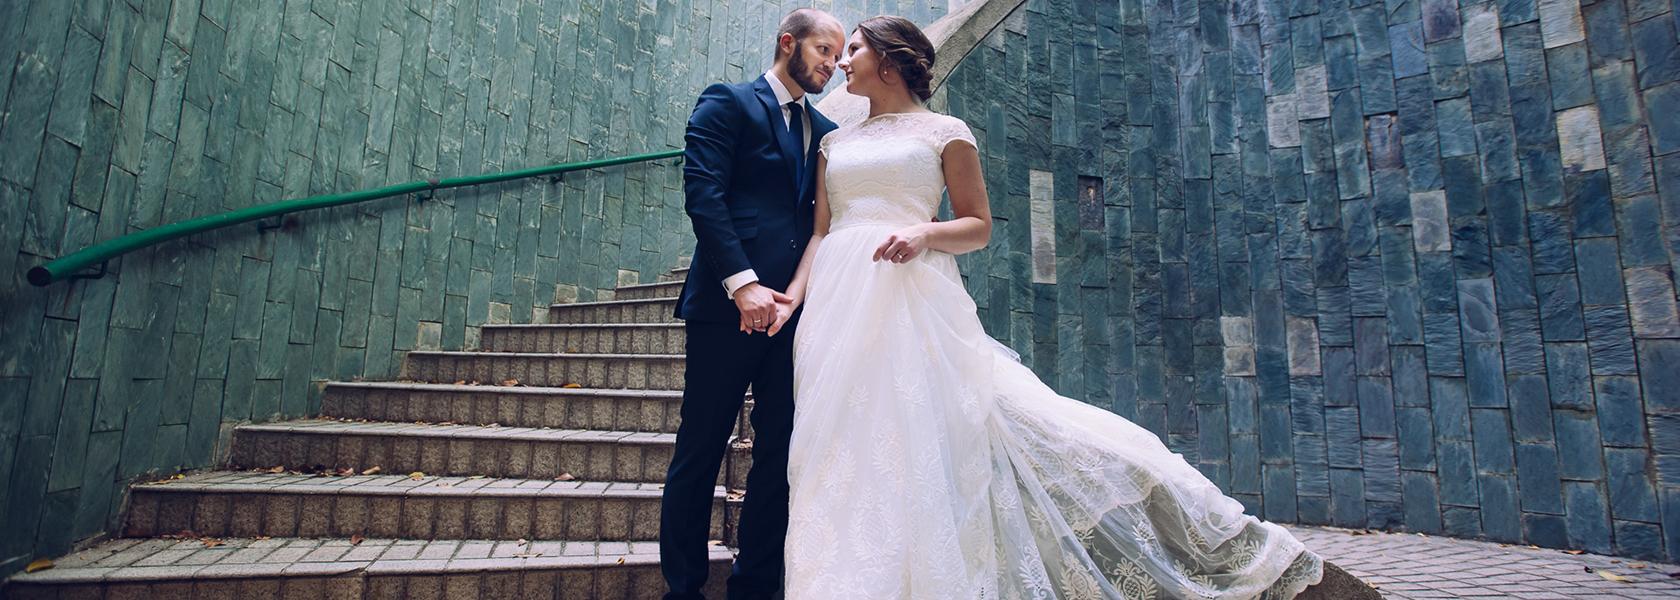 Cathrine hakon wedding 649